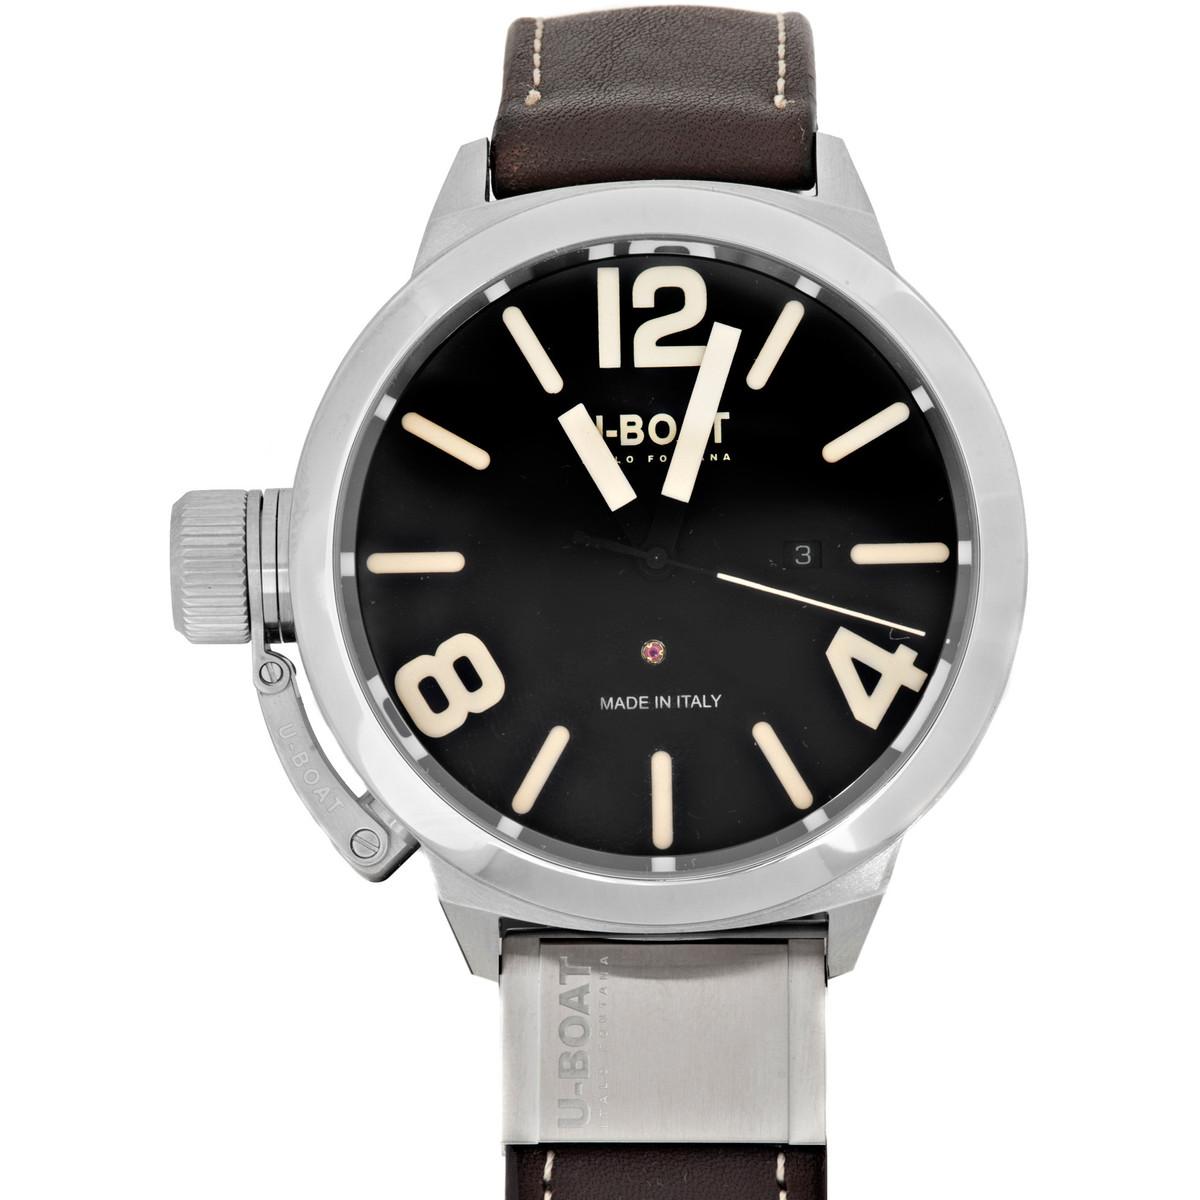 Ceas barbatesc U-Boat Classico 7120 de mana original